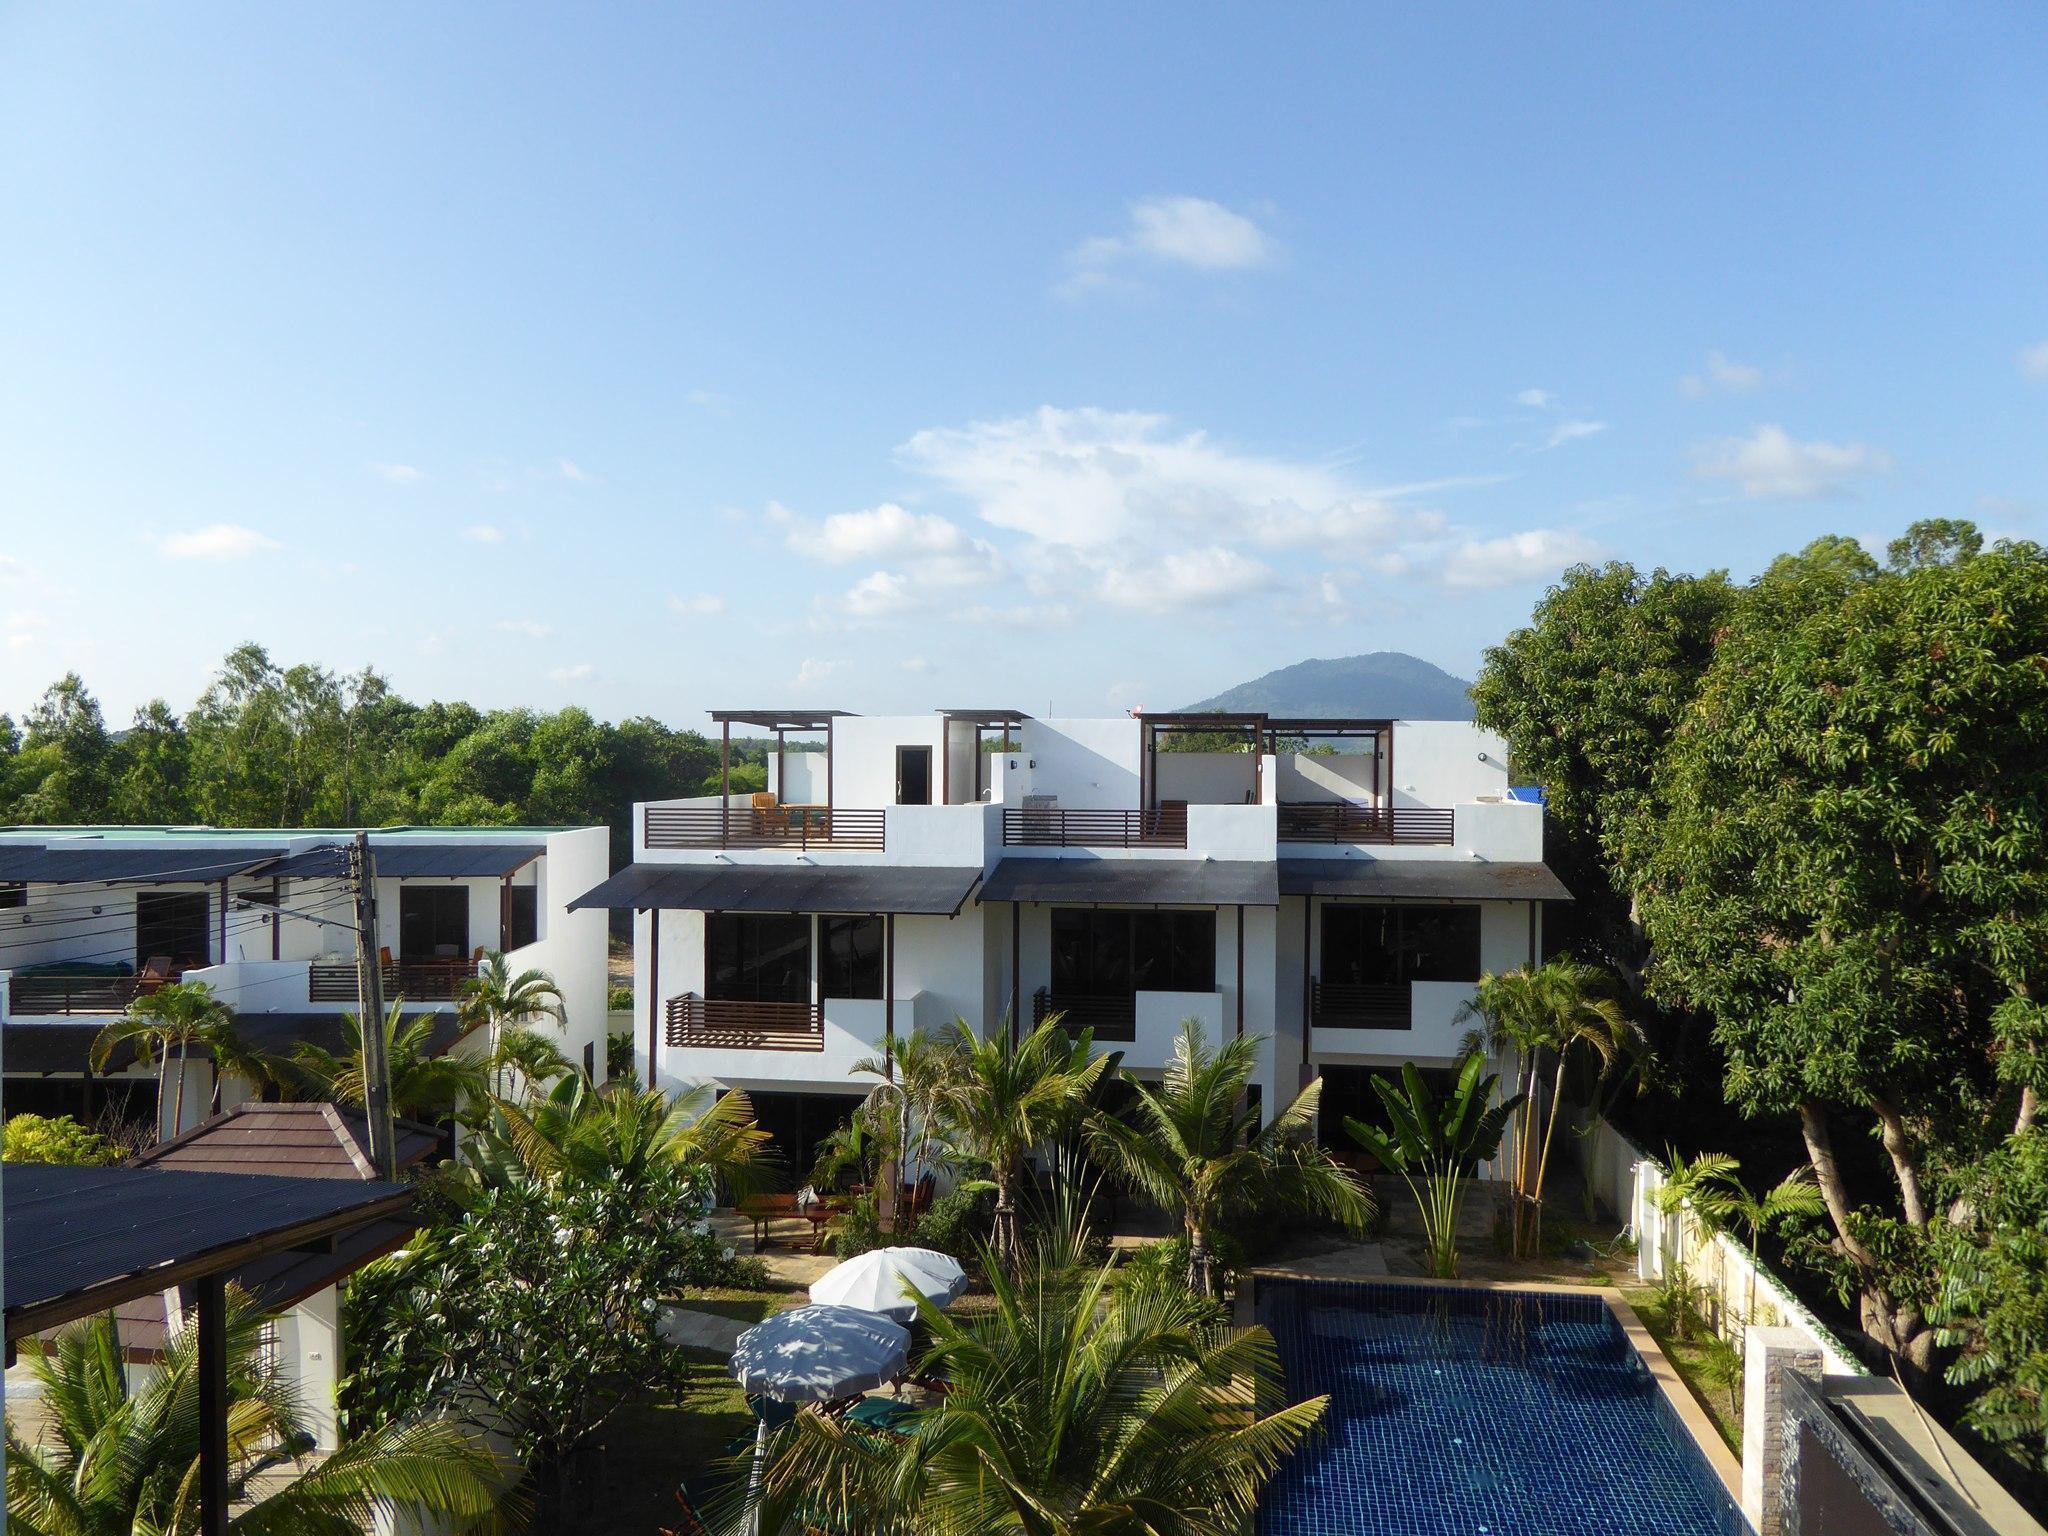 Oasis Garden and Pool Villa at VIP Chain Resort โอเอซิส การ์เดน แอนด์ พูล วิลลา แอท วีไอพี เชน รีสอร์ต